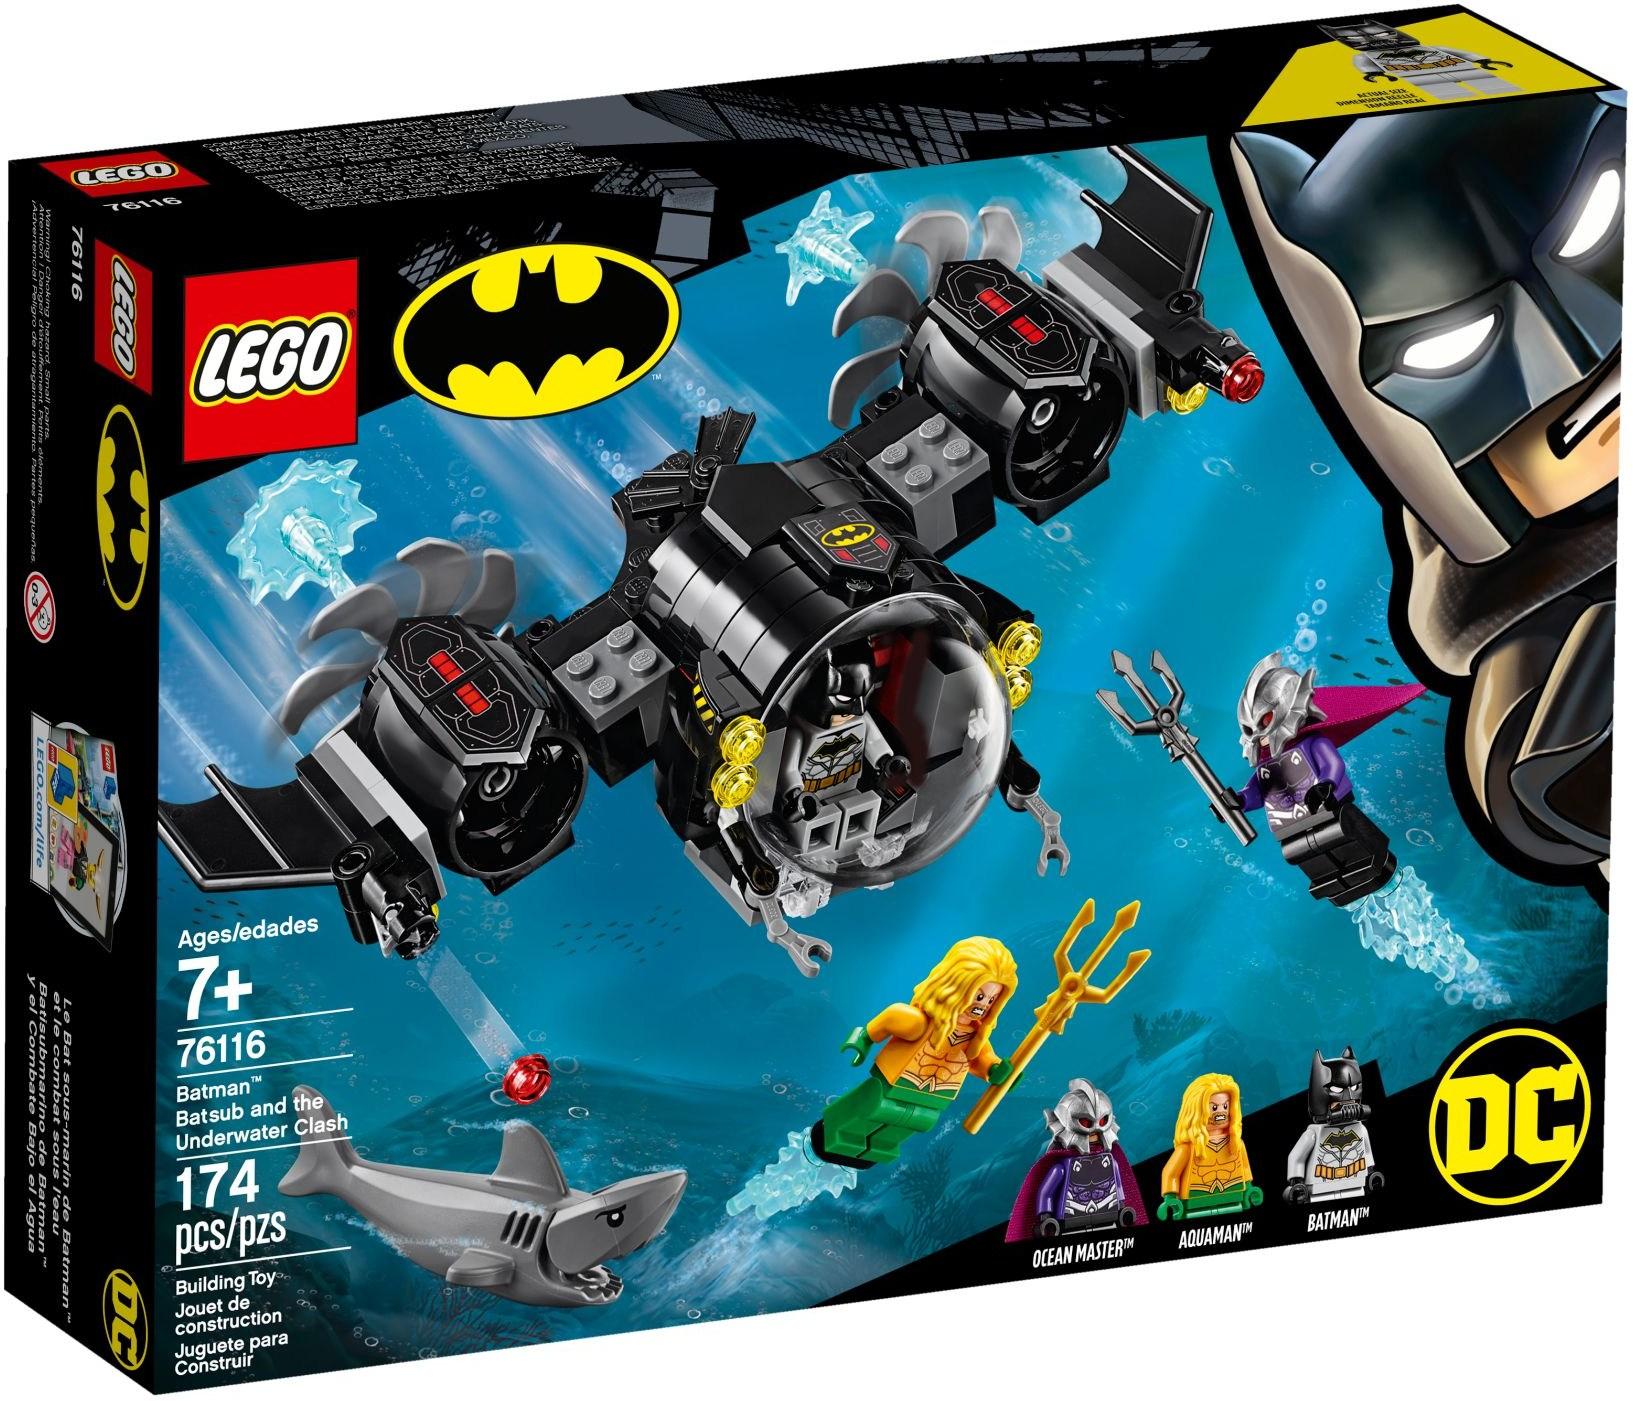 76116 Batman Batsub and the Underwater Clash